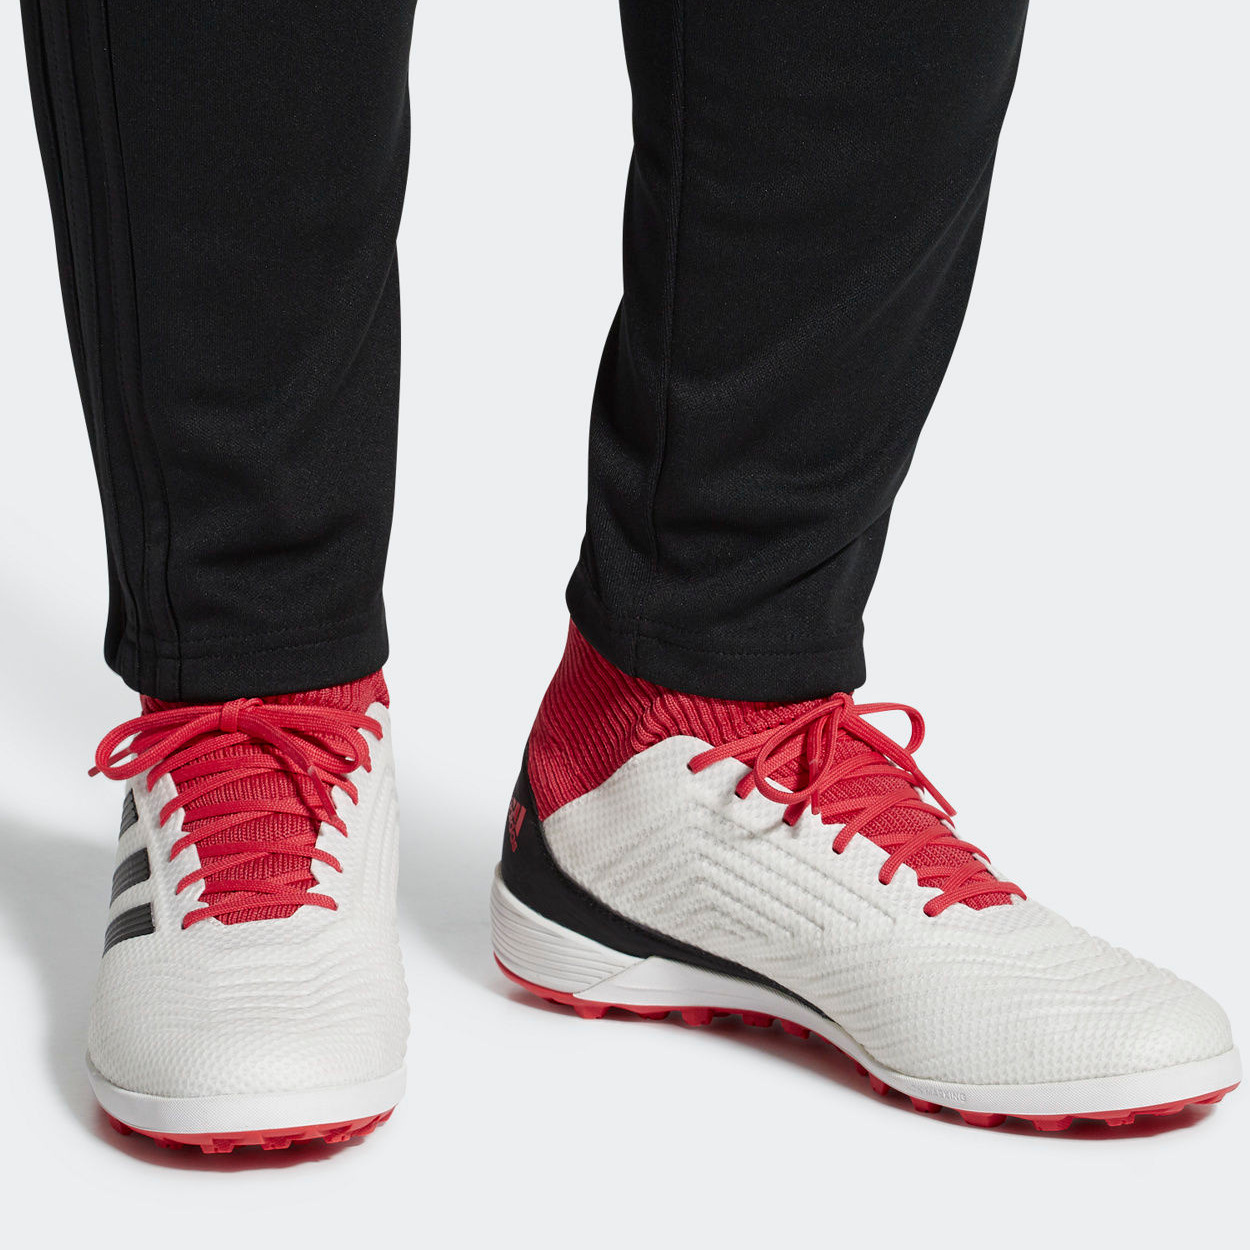 uk adidas protator turf weiß 2b8c0 be183